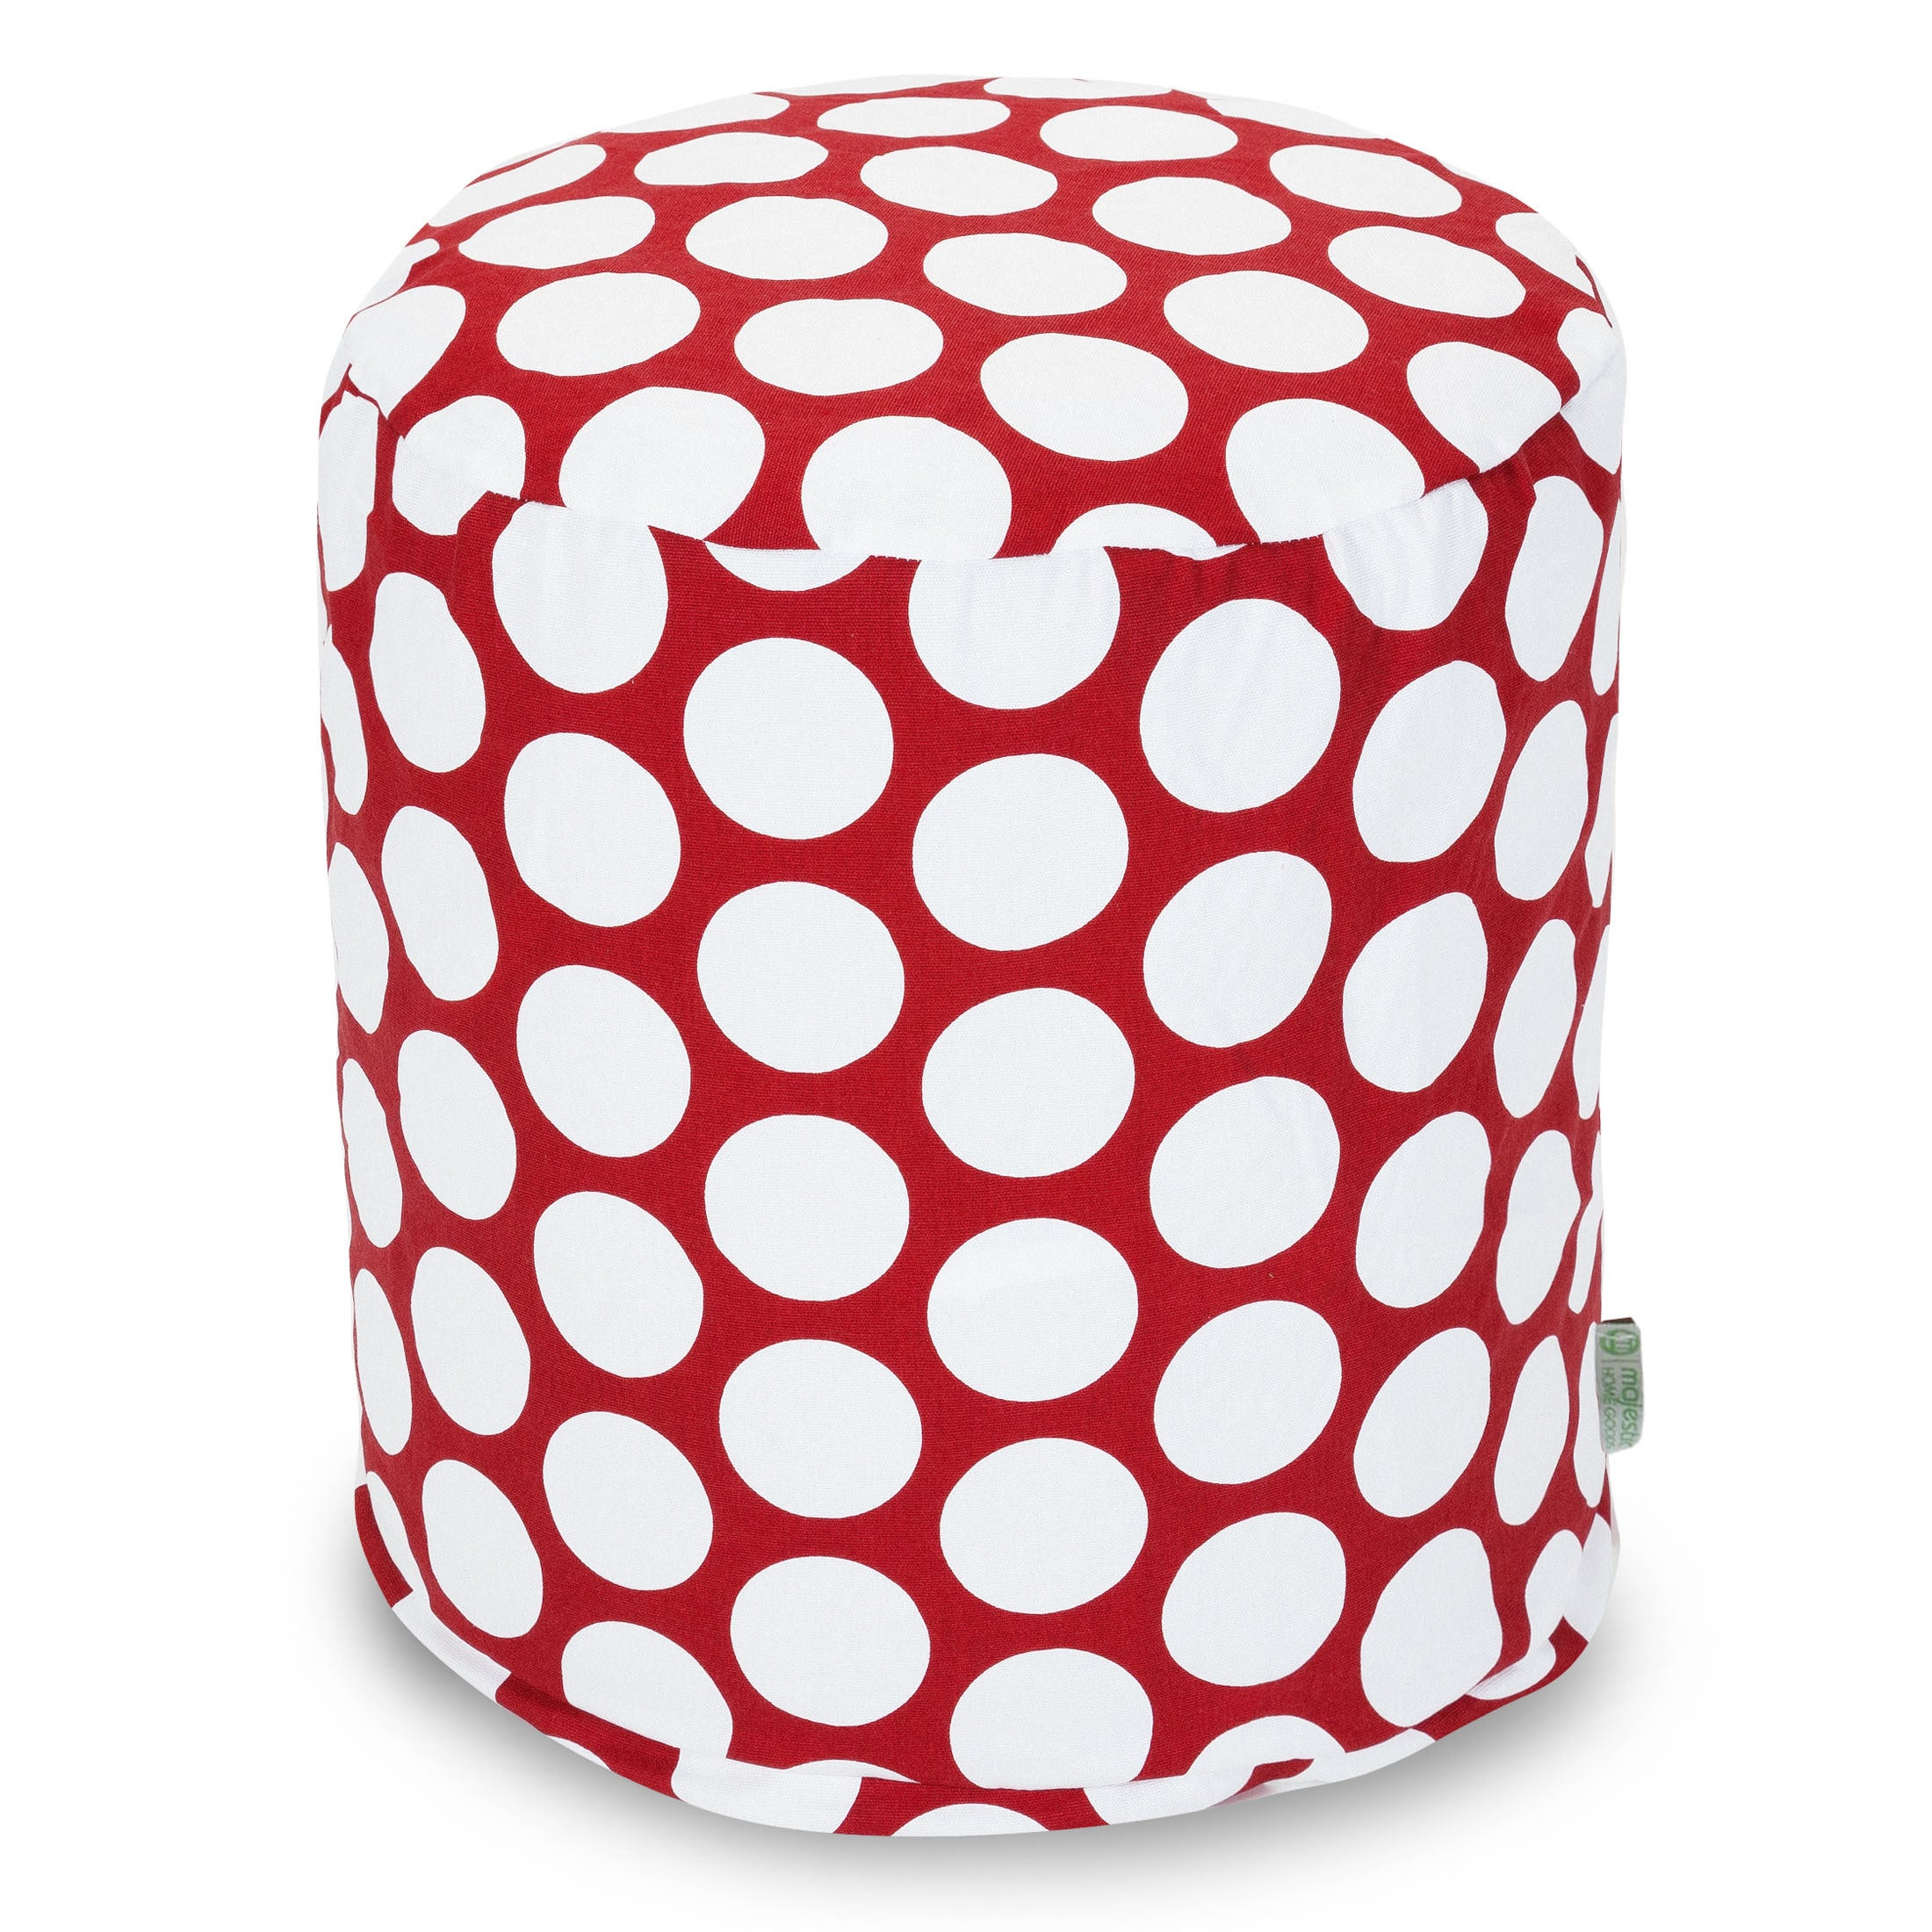 Majestic Home Goods Large Polka Dot Pouf (Red), Size Medi...